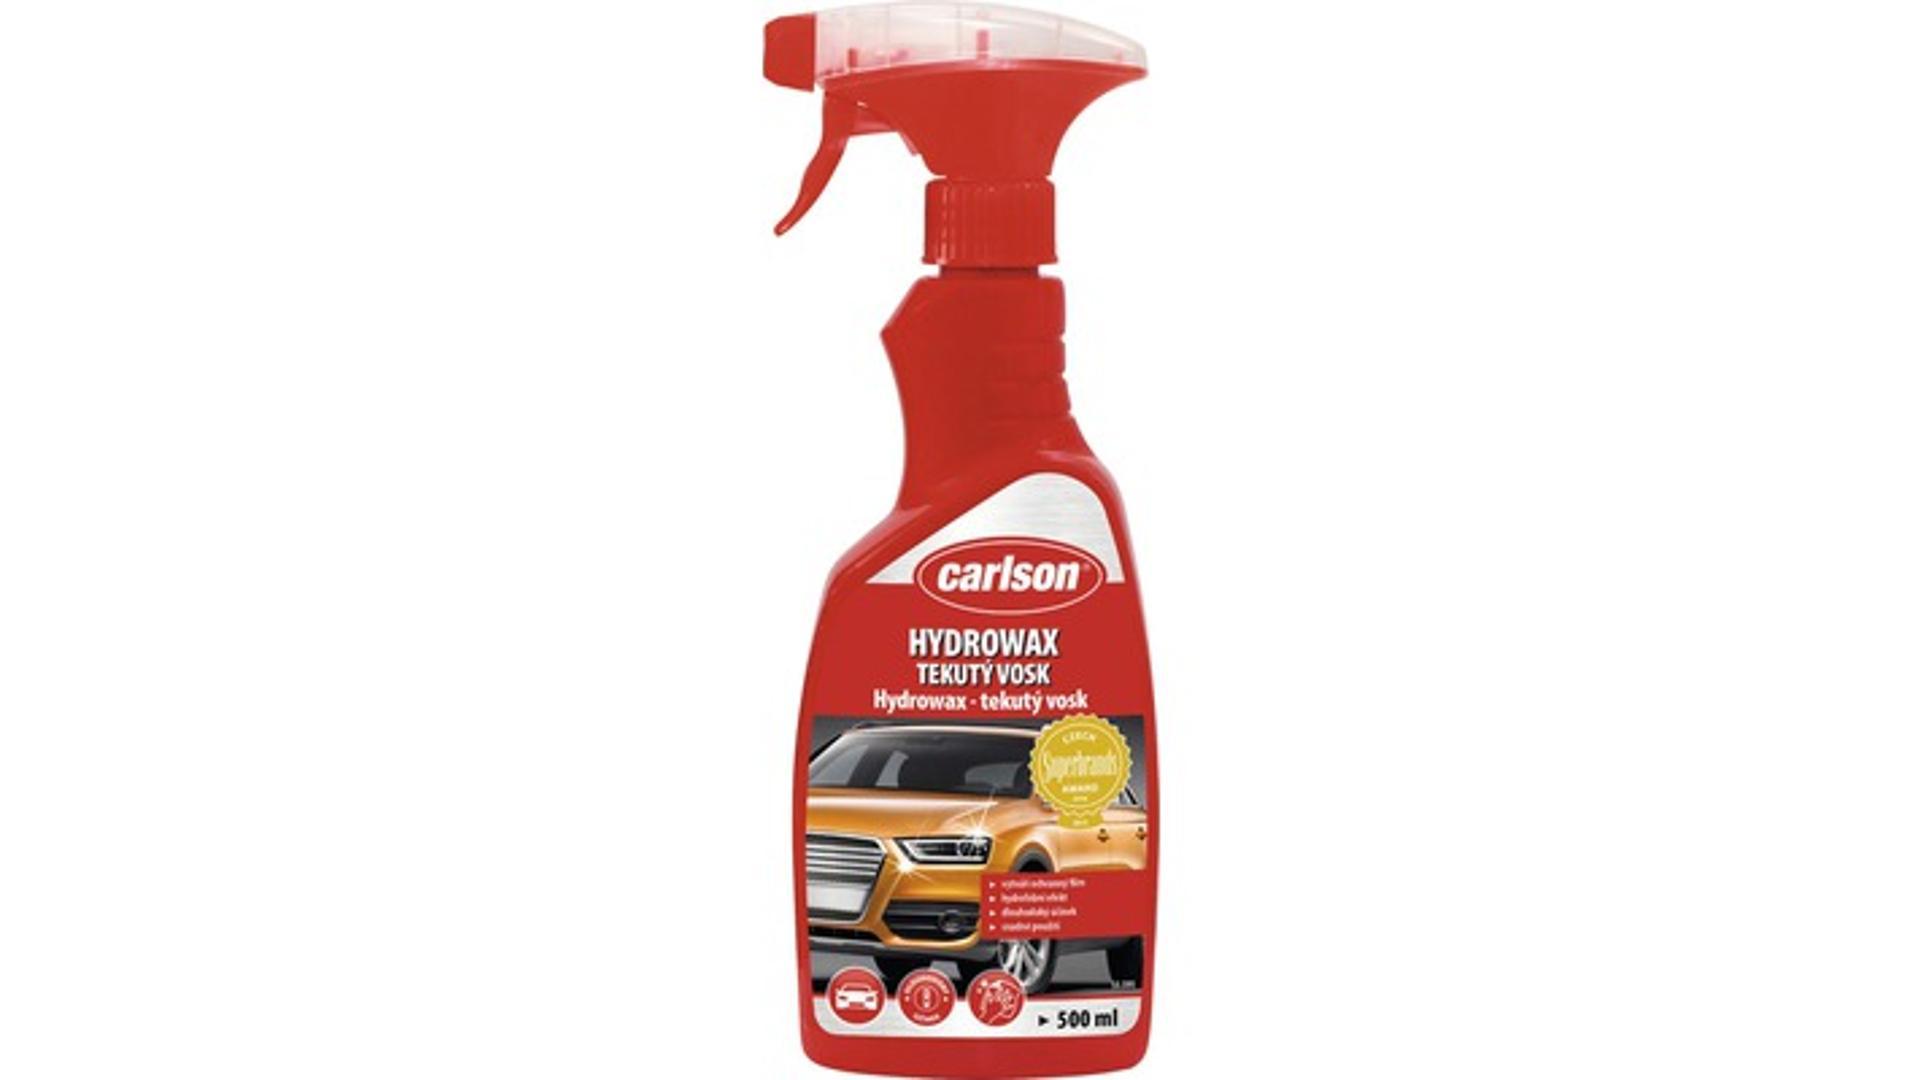 CARLSON hydrowax - tekutej vosk 500ml